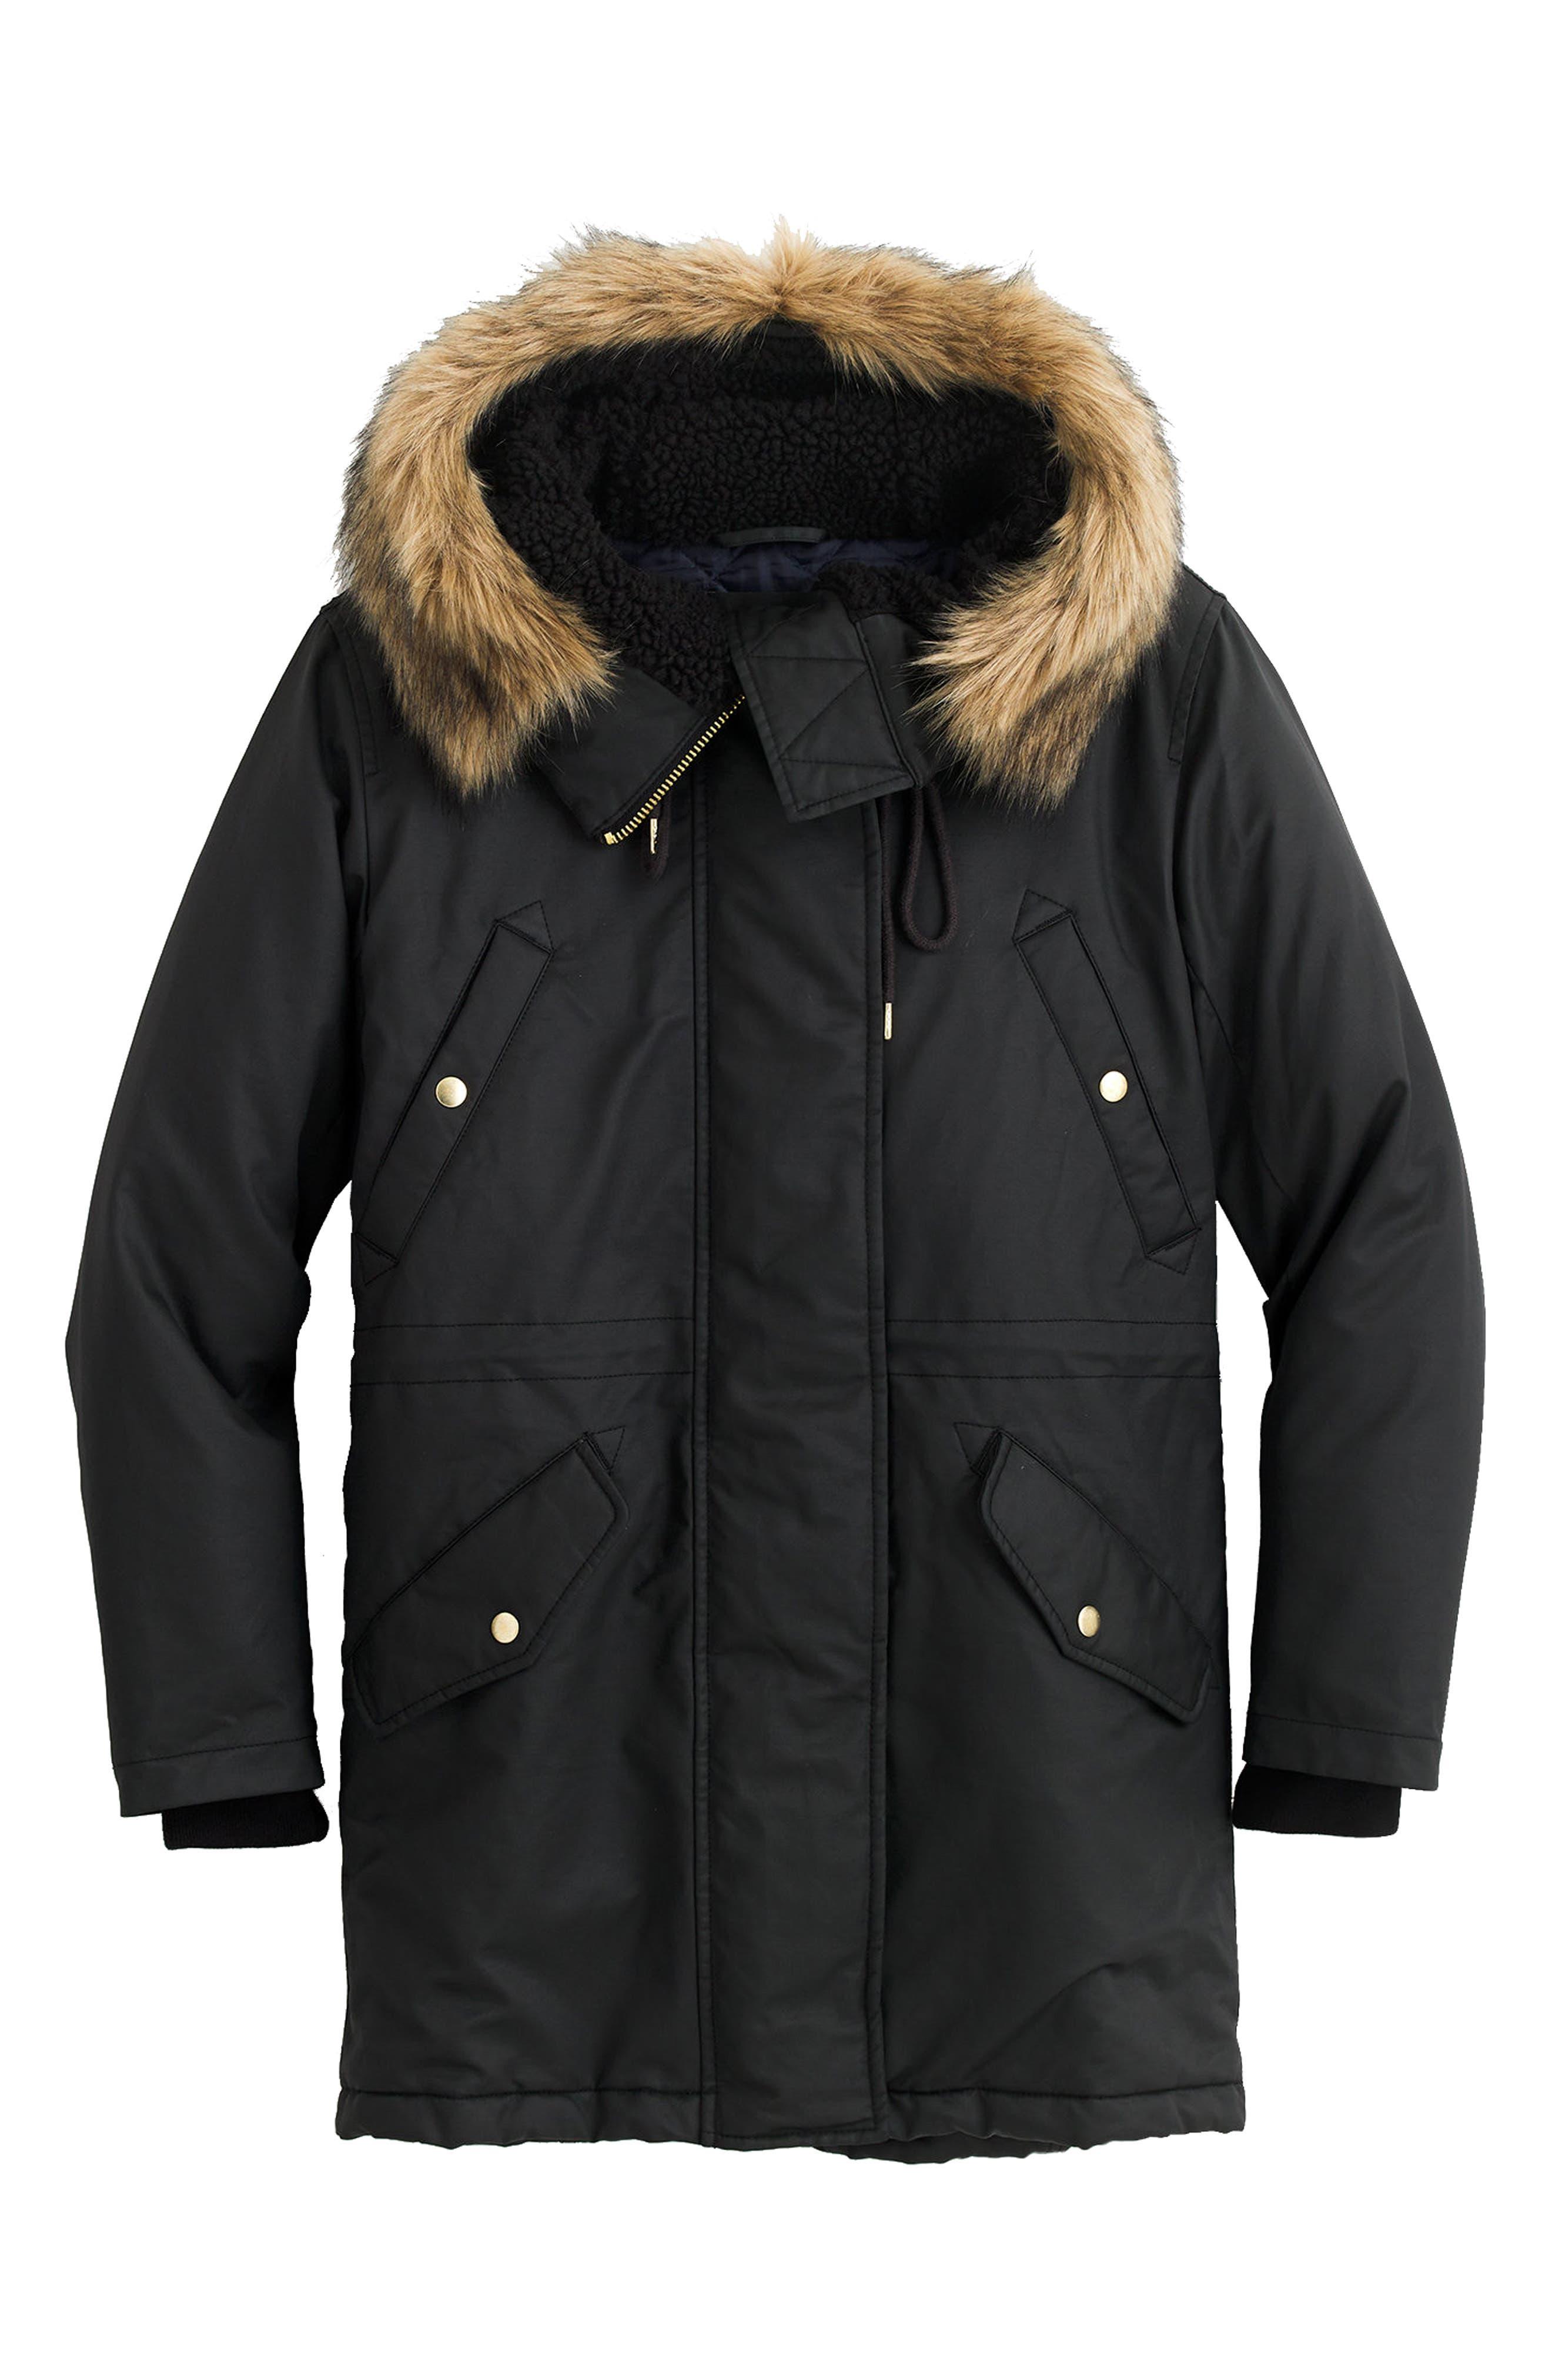 J.Crew Perfect Winter Parka with Faux Fur Trim (Regular & Petite ...